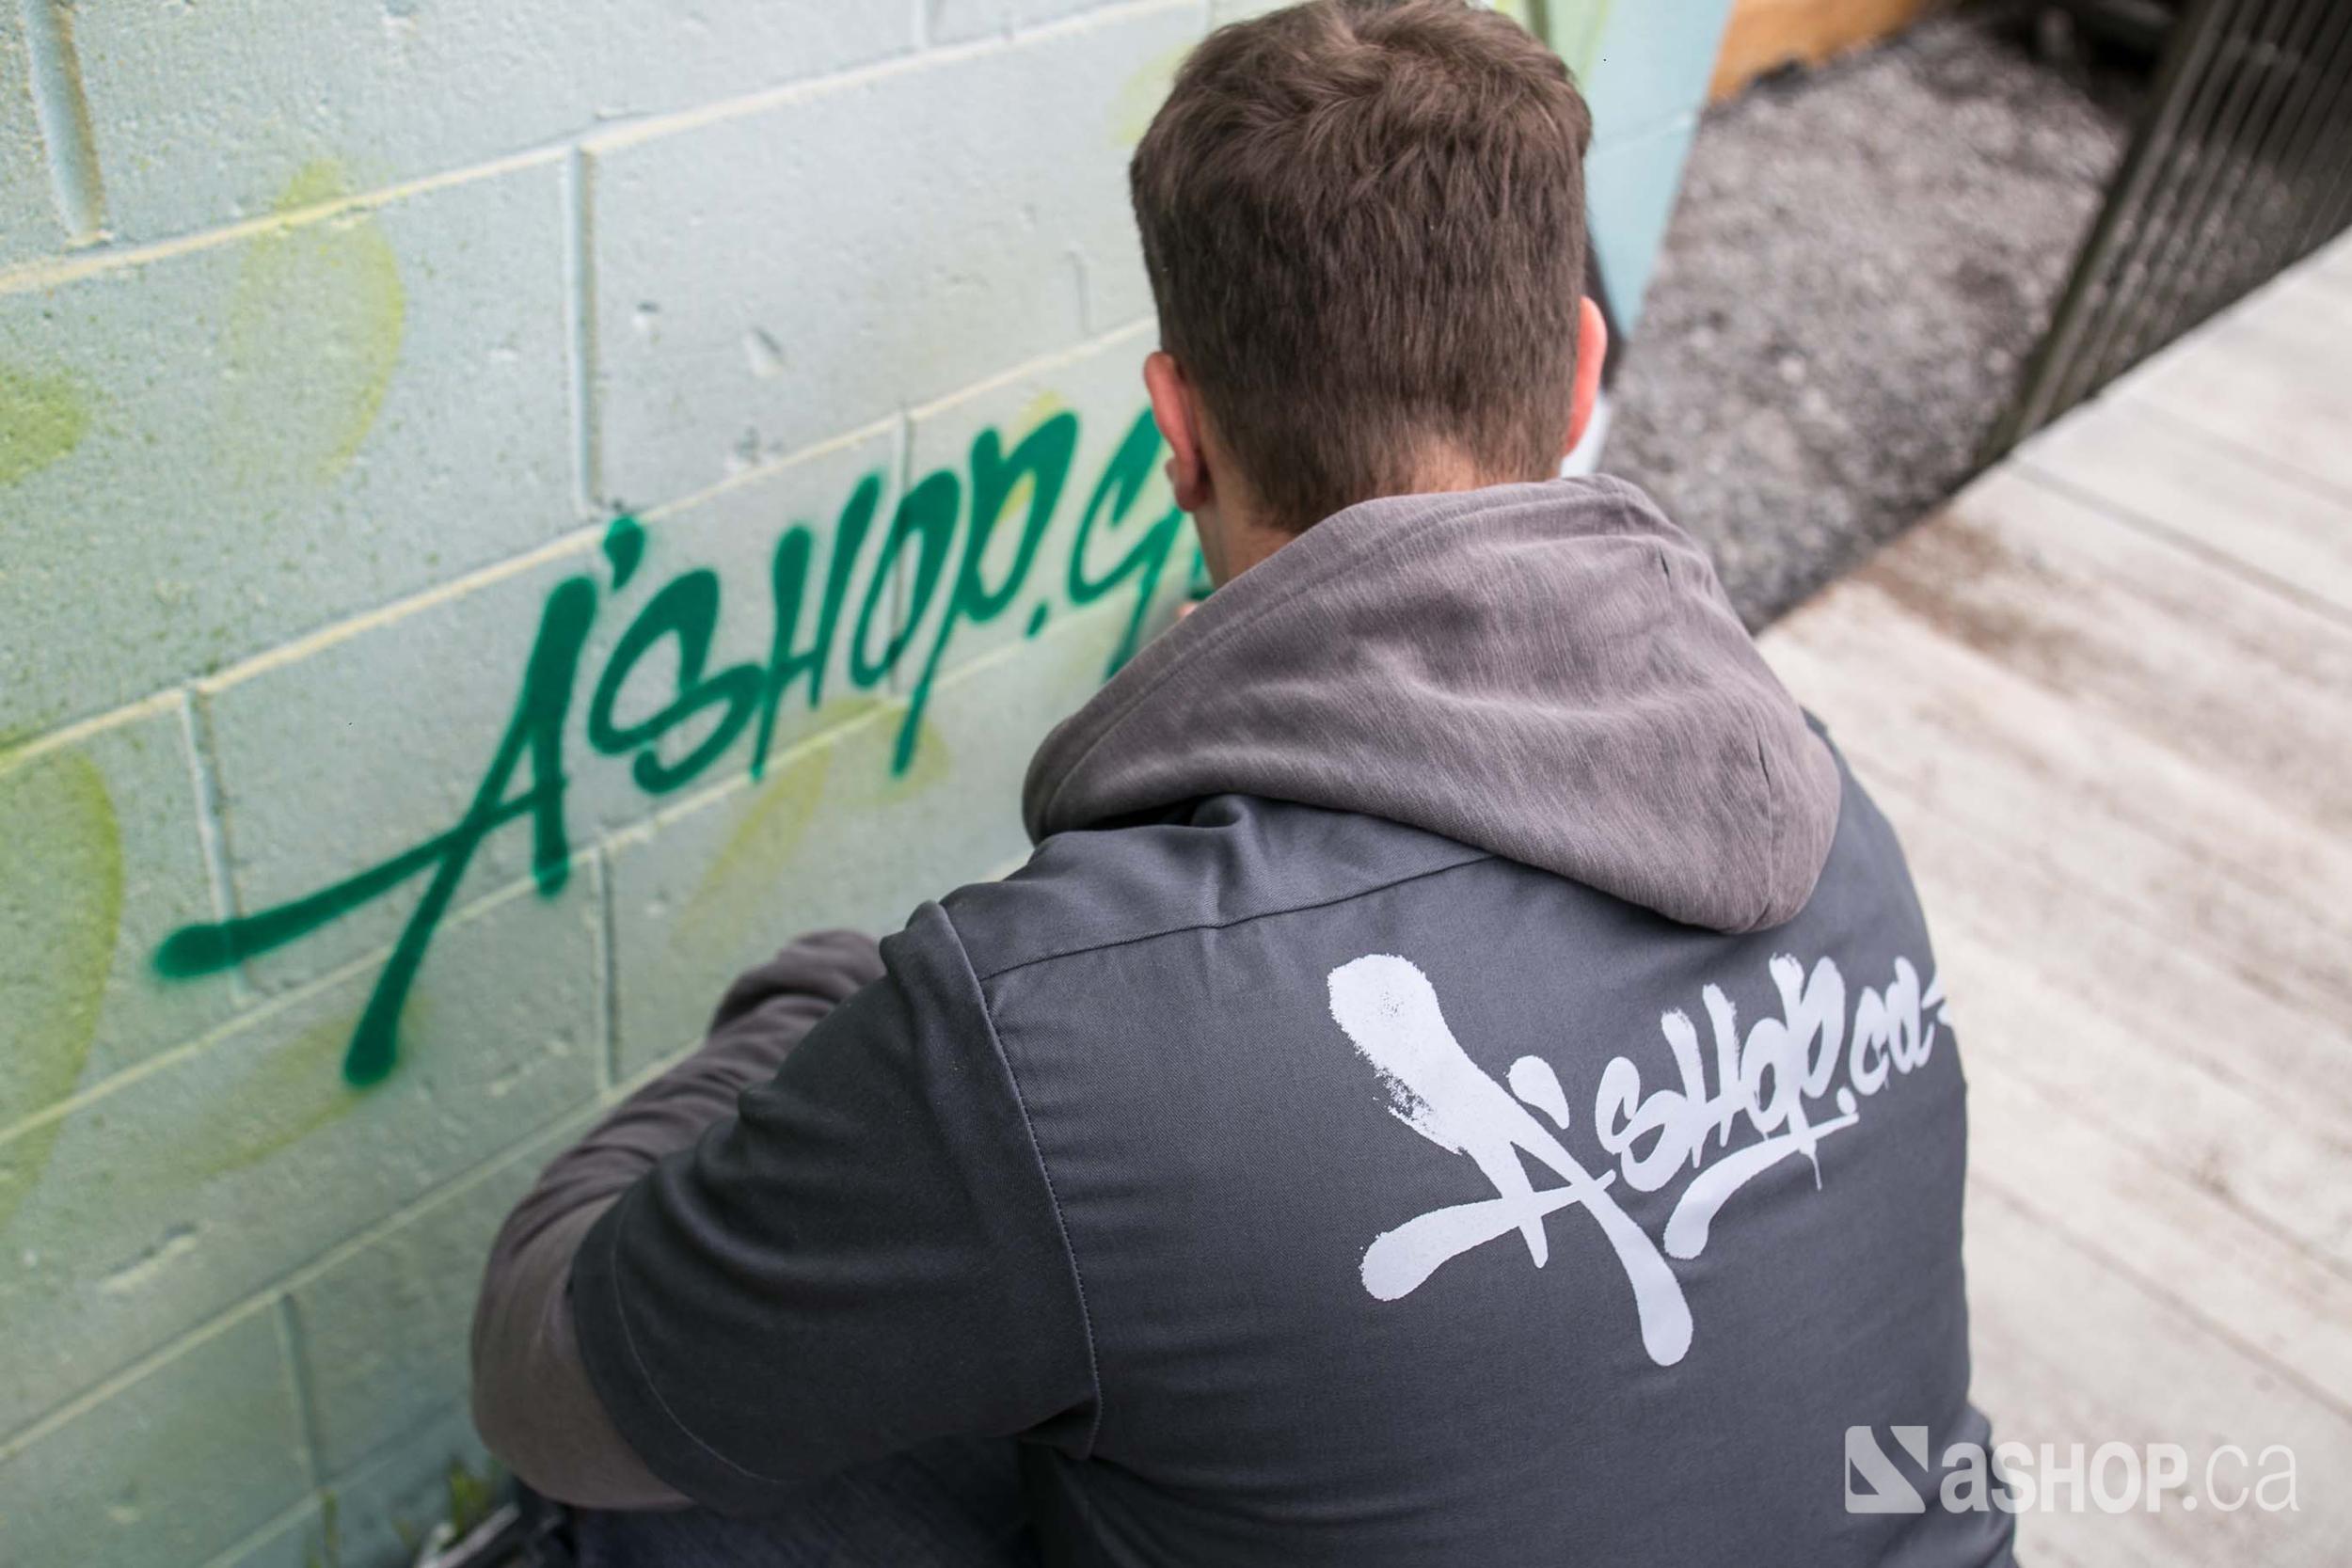 ashop-a'shop-mural-graffiti-street-art-c2-mtl-zek-zeck-zeko-tagging.jpg